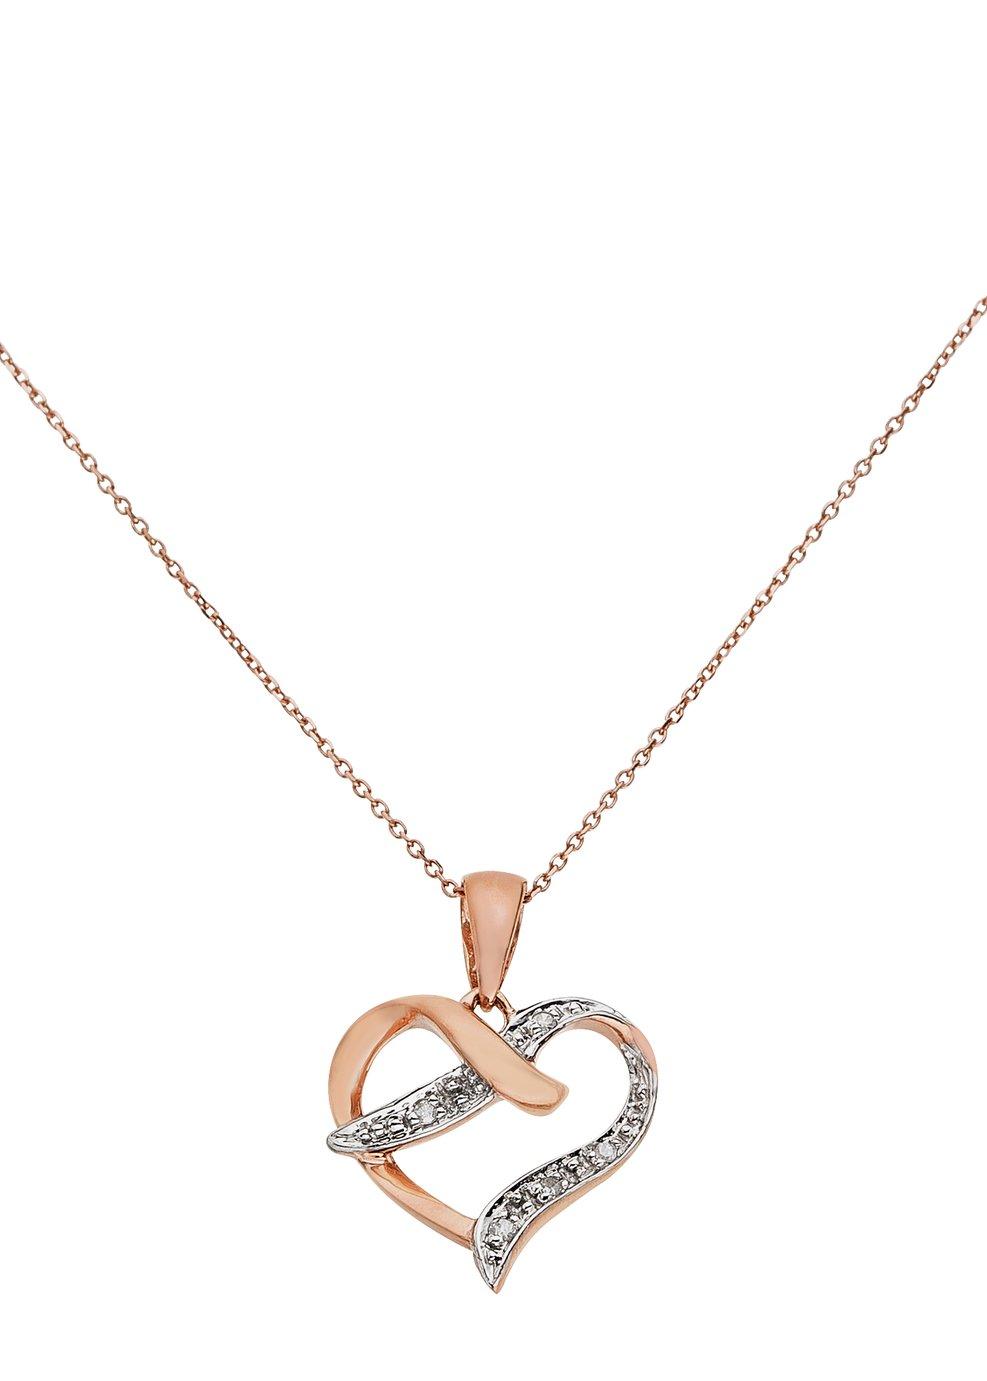 Image of 9 Carat Rose Gold - Diamond Accent Heart Pendant.